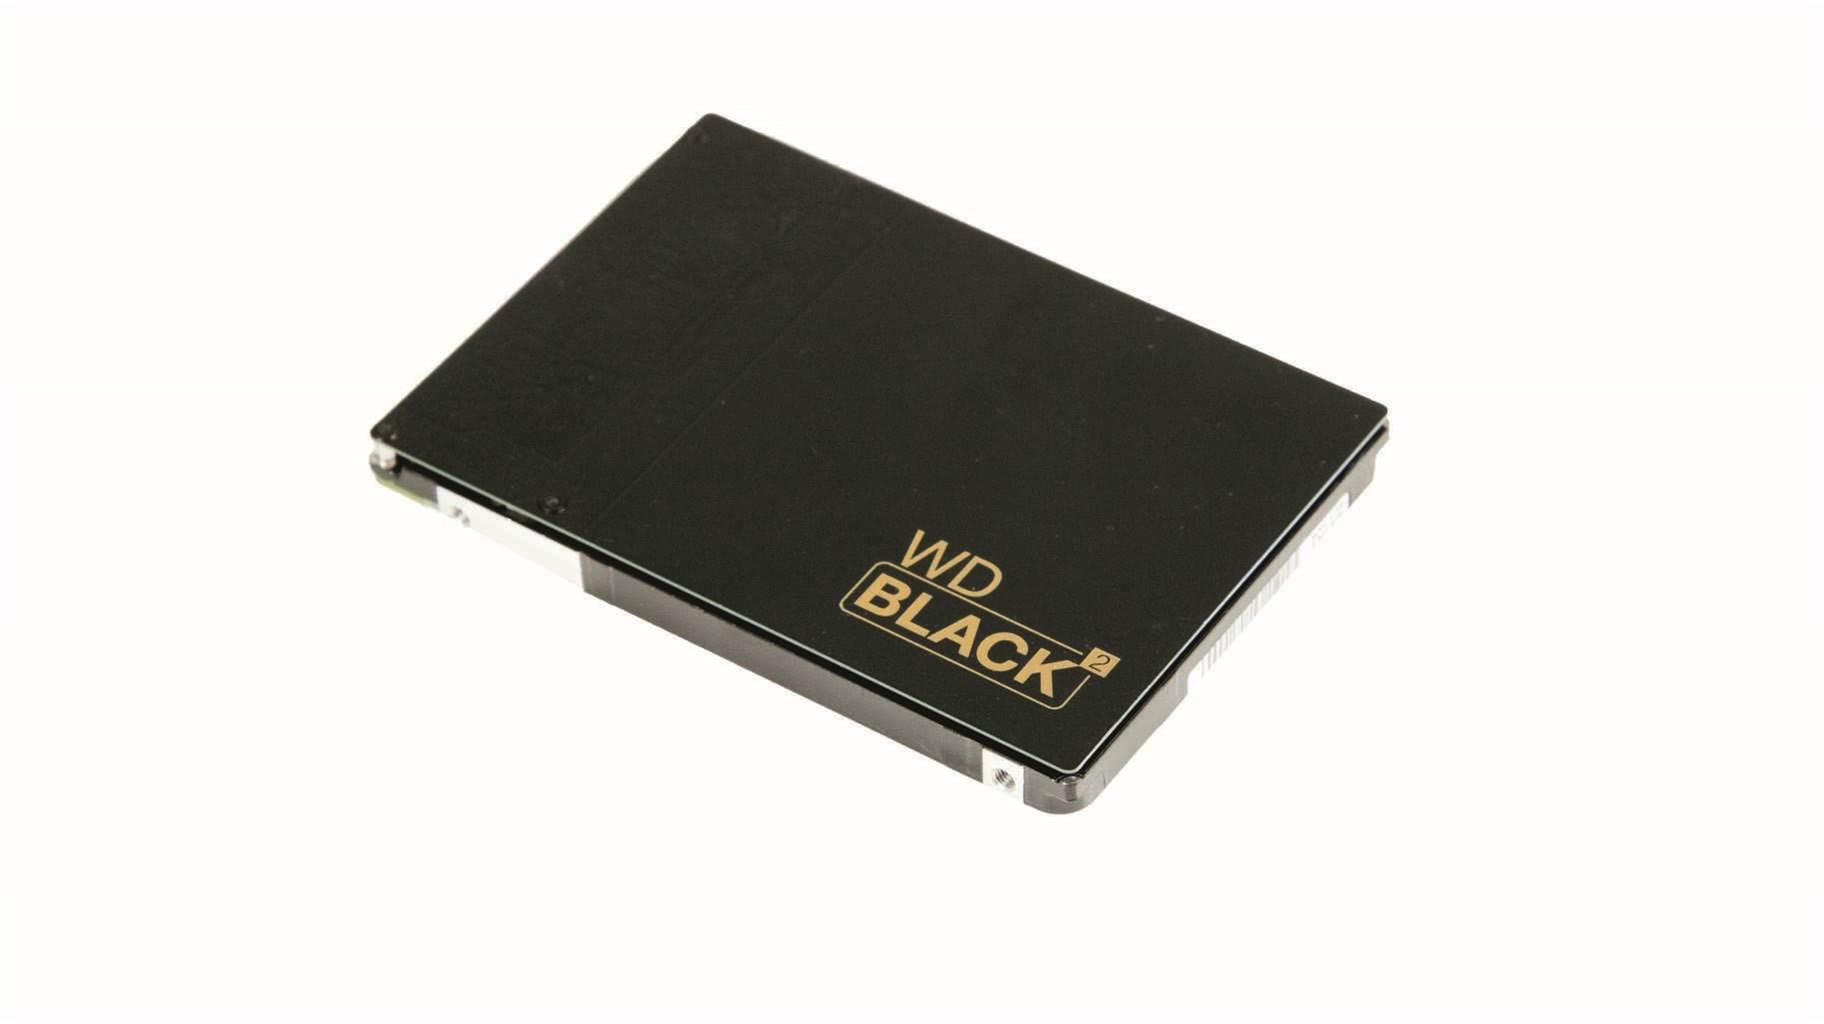 Review: WD Black2 Dual Drive